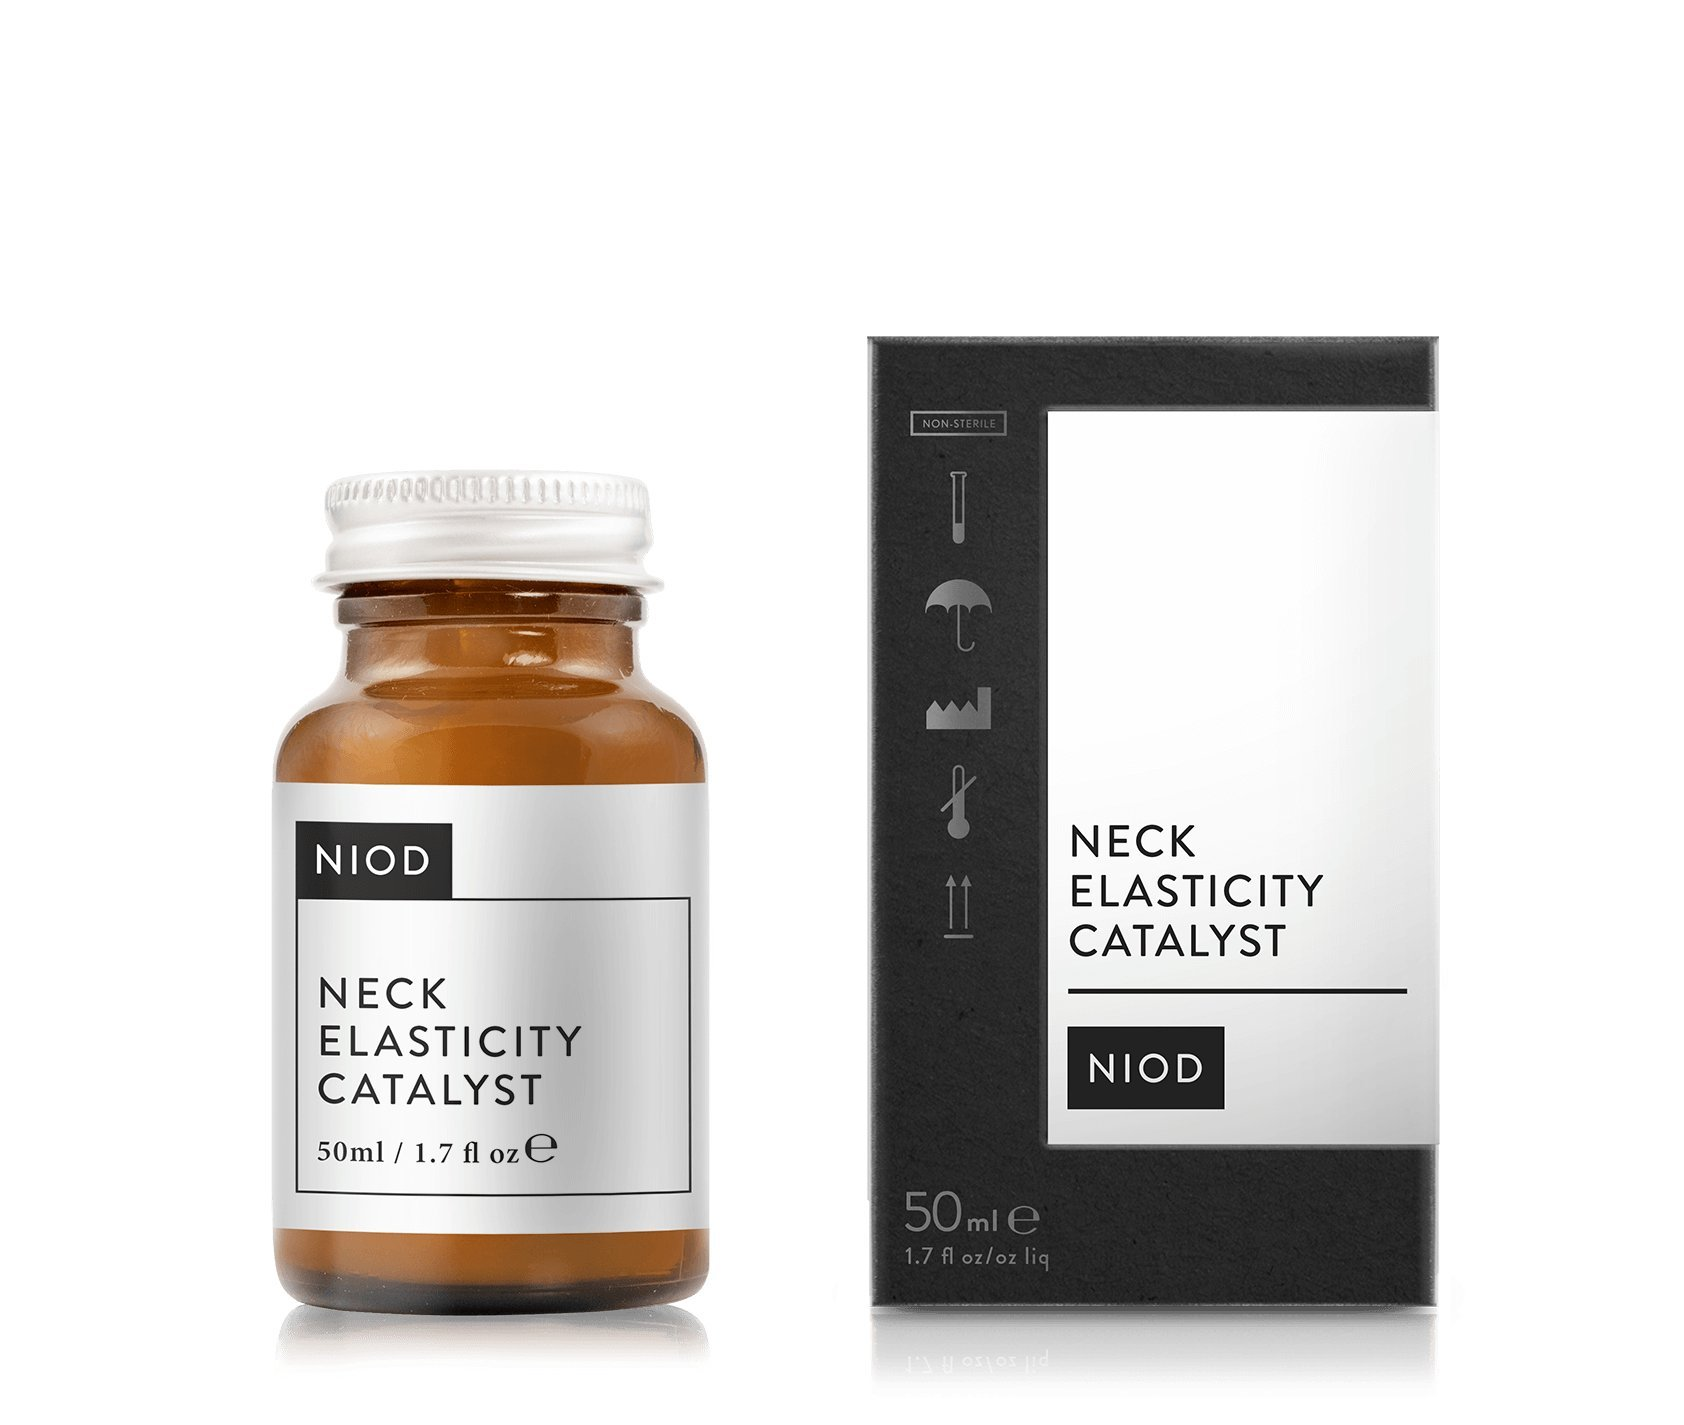 niod Neck ELASTI City Catalyst 50ML